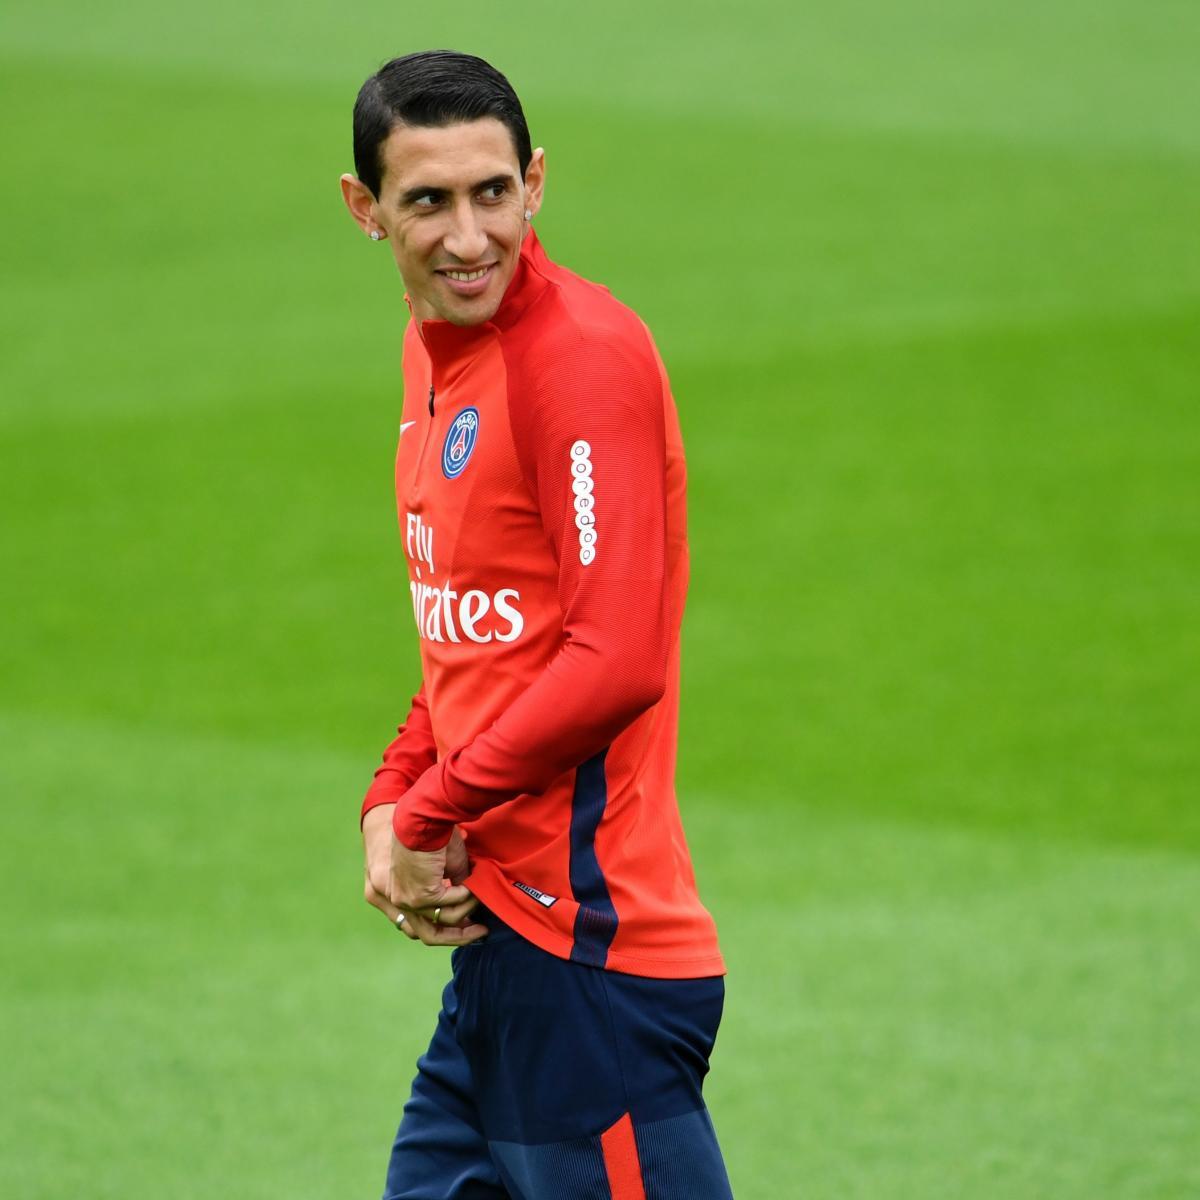 Liverpool Fc Transfer Gossip Reds Close In On Barcelona: Barcelona Transfer News: Angel Di Maria, Jean Michael Seri